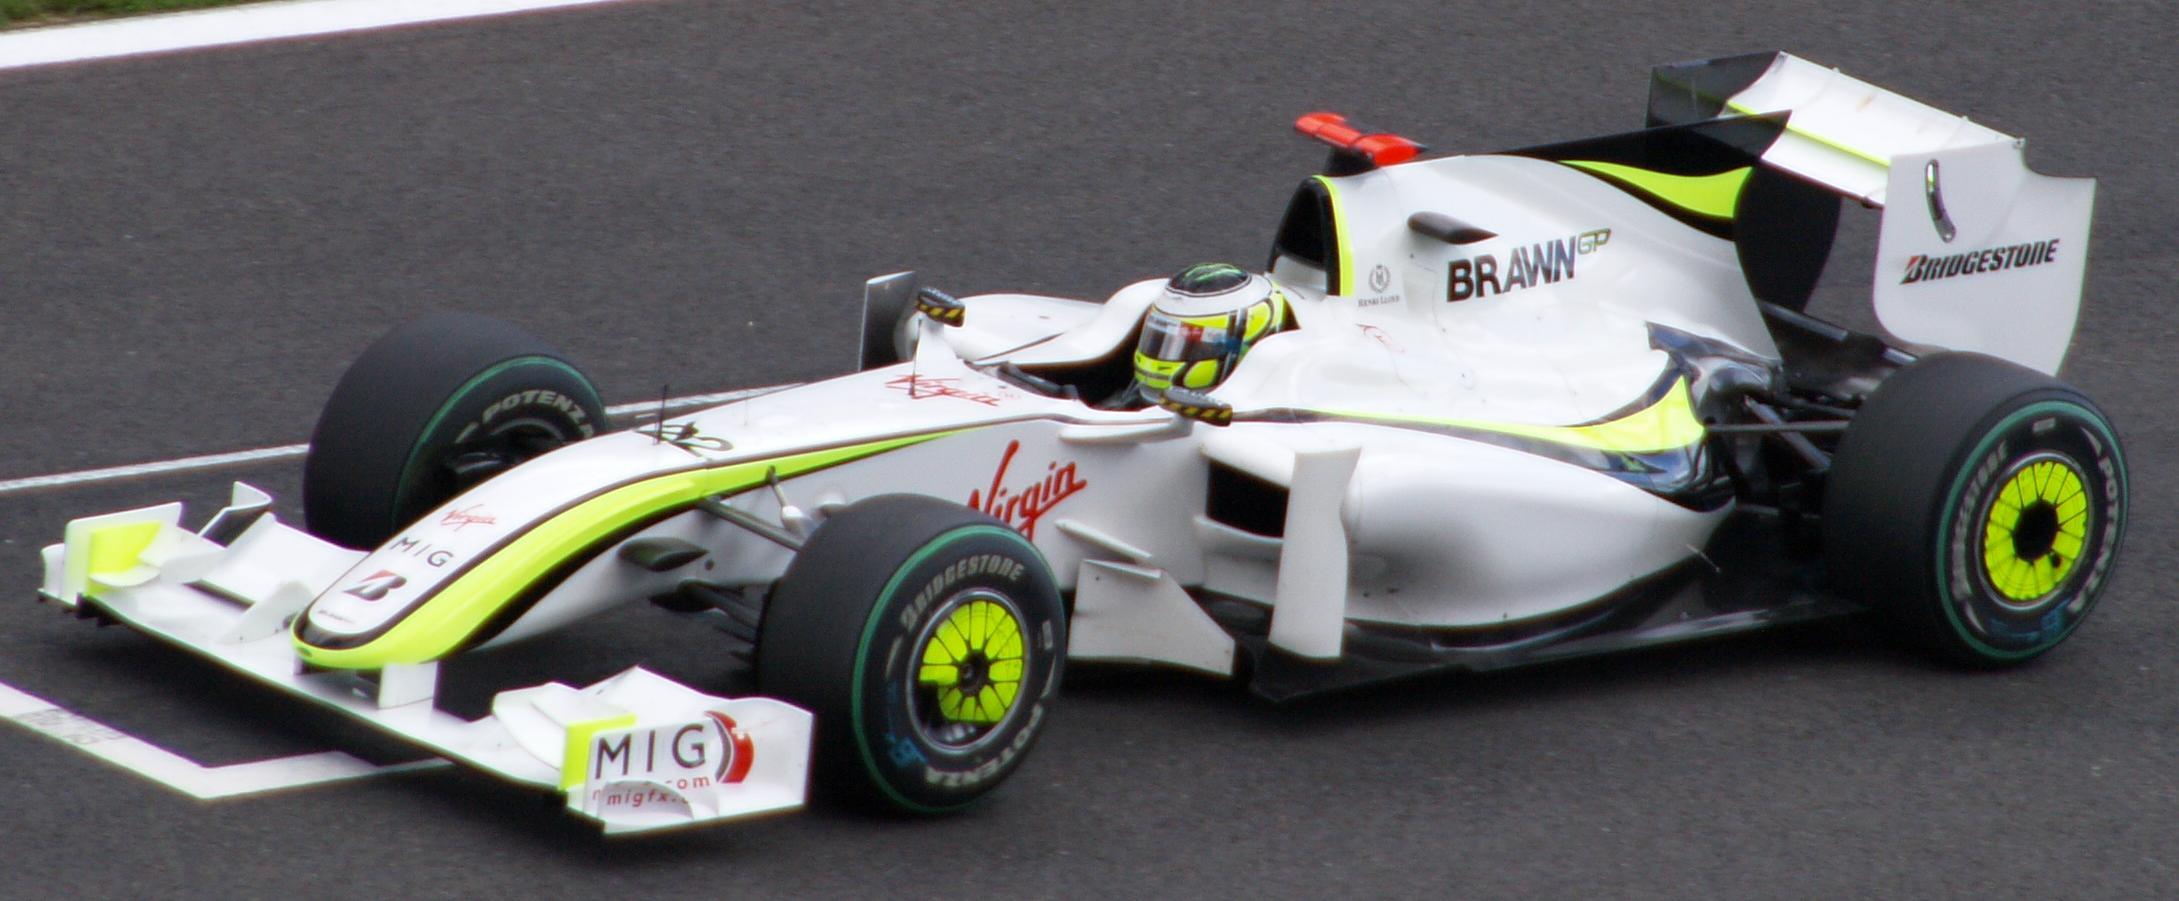 2009 - Brawn GP F1 Team